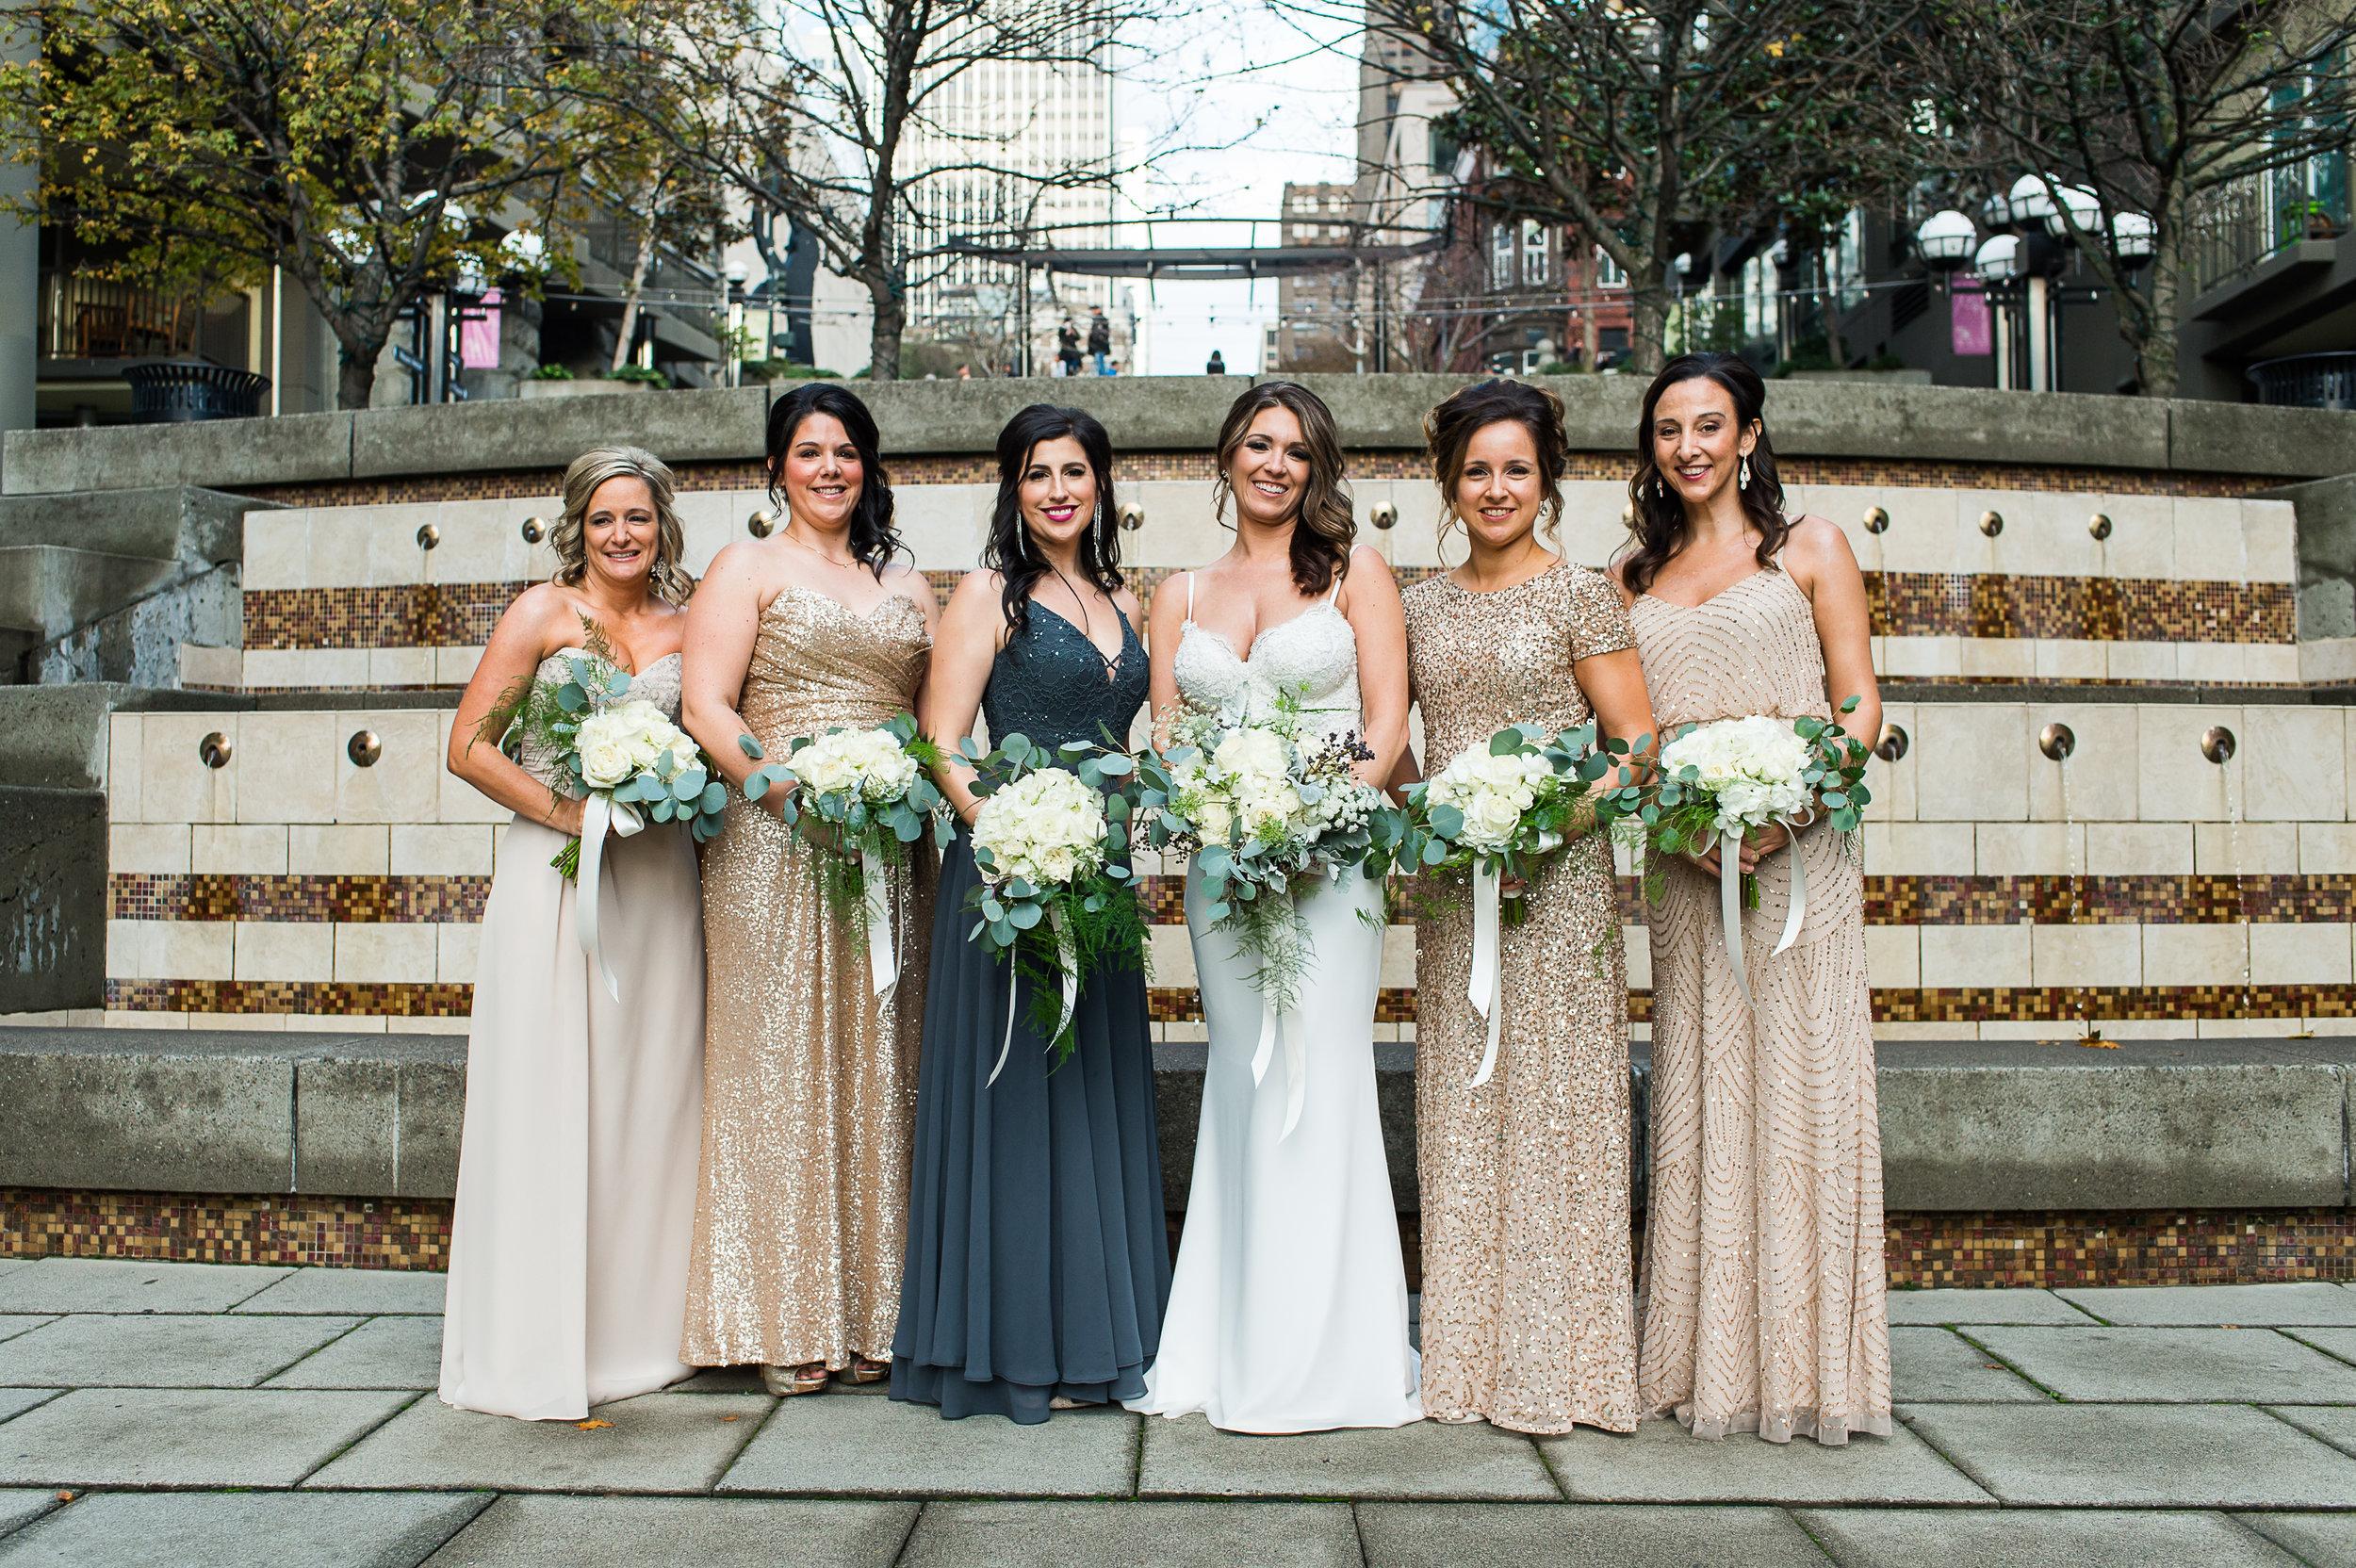 JJ-wedding-Van-Wyhe-Photography-194.jpg